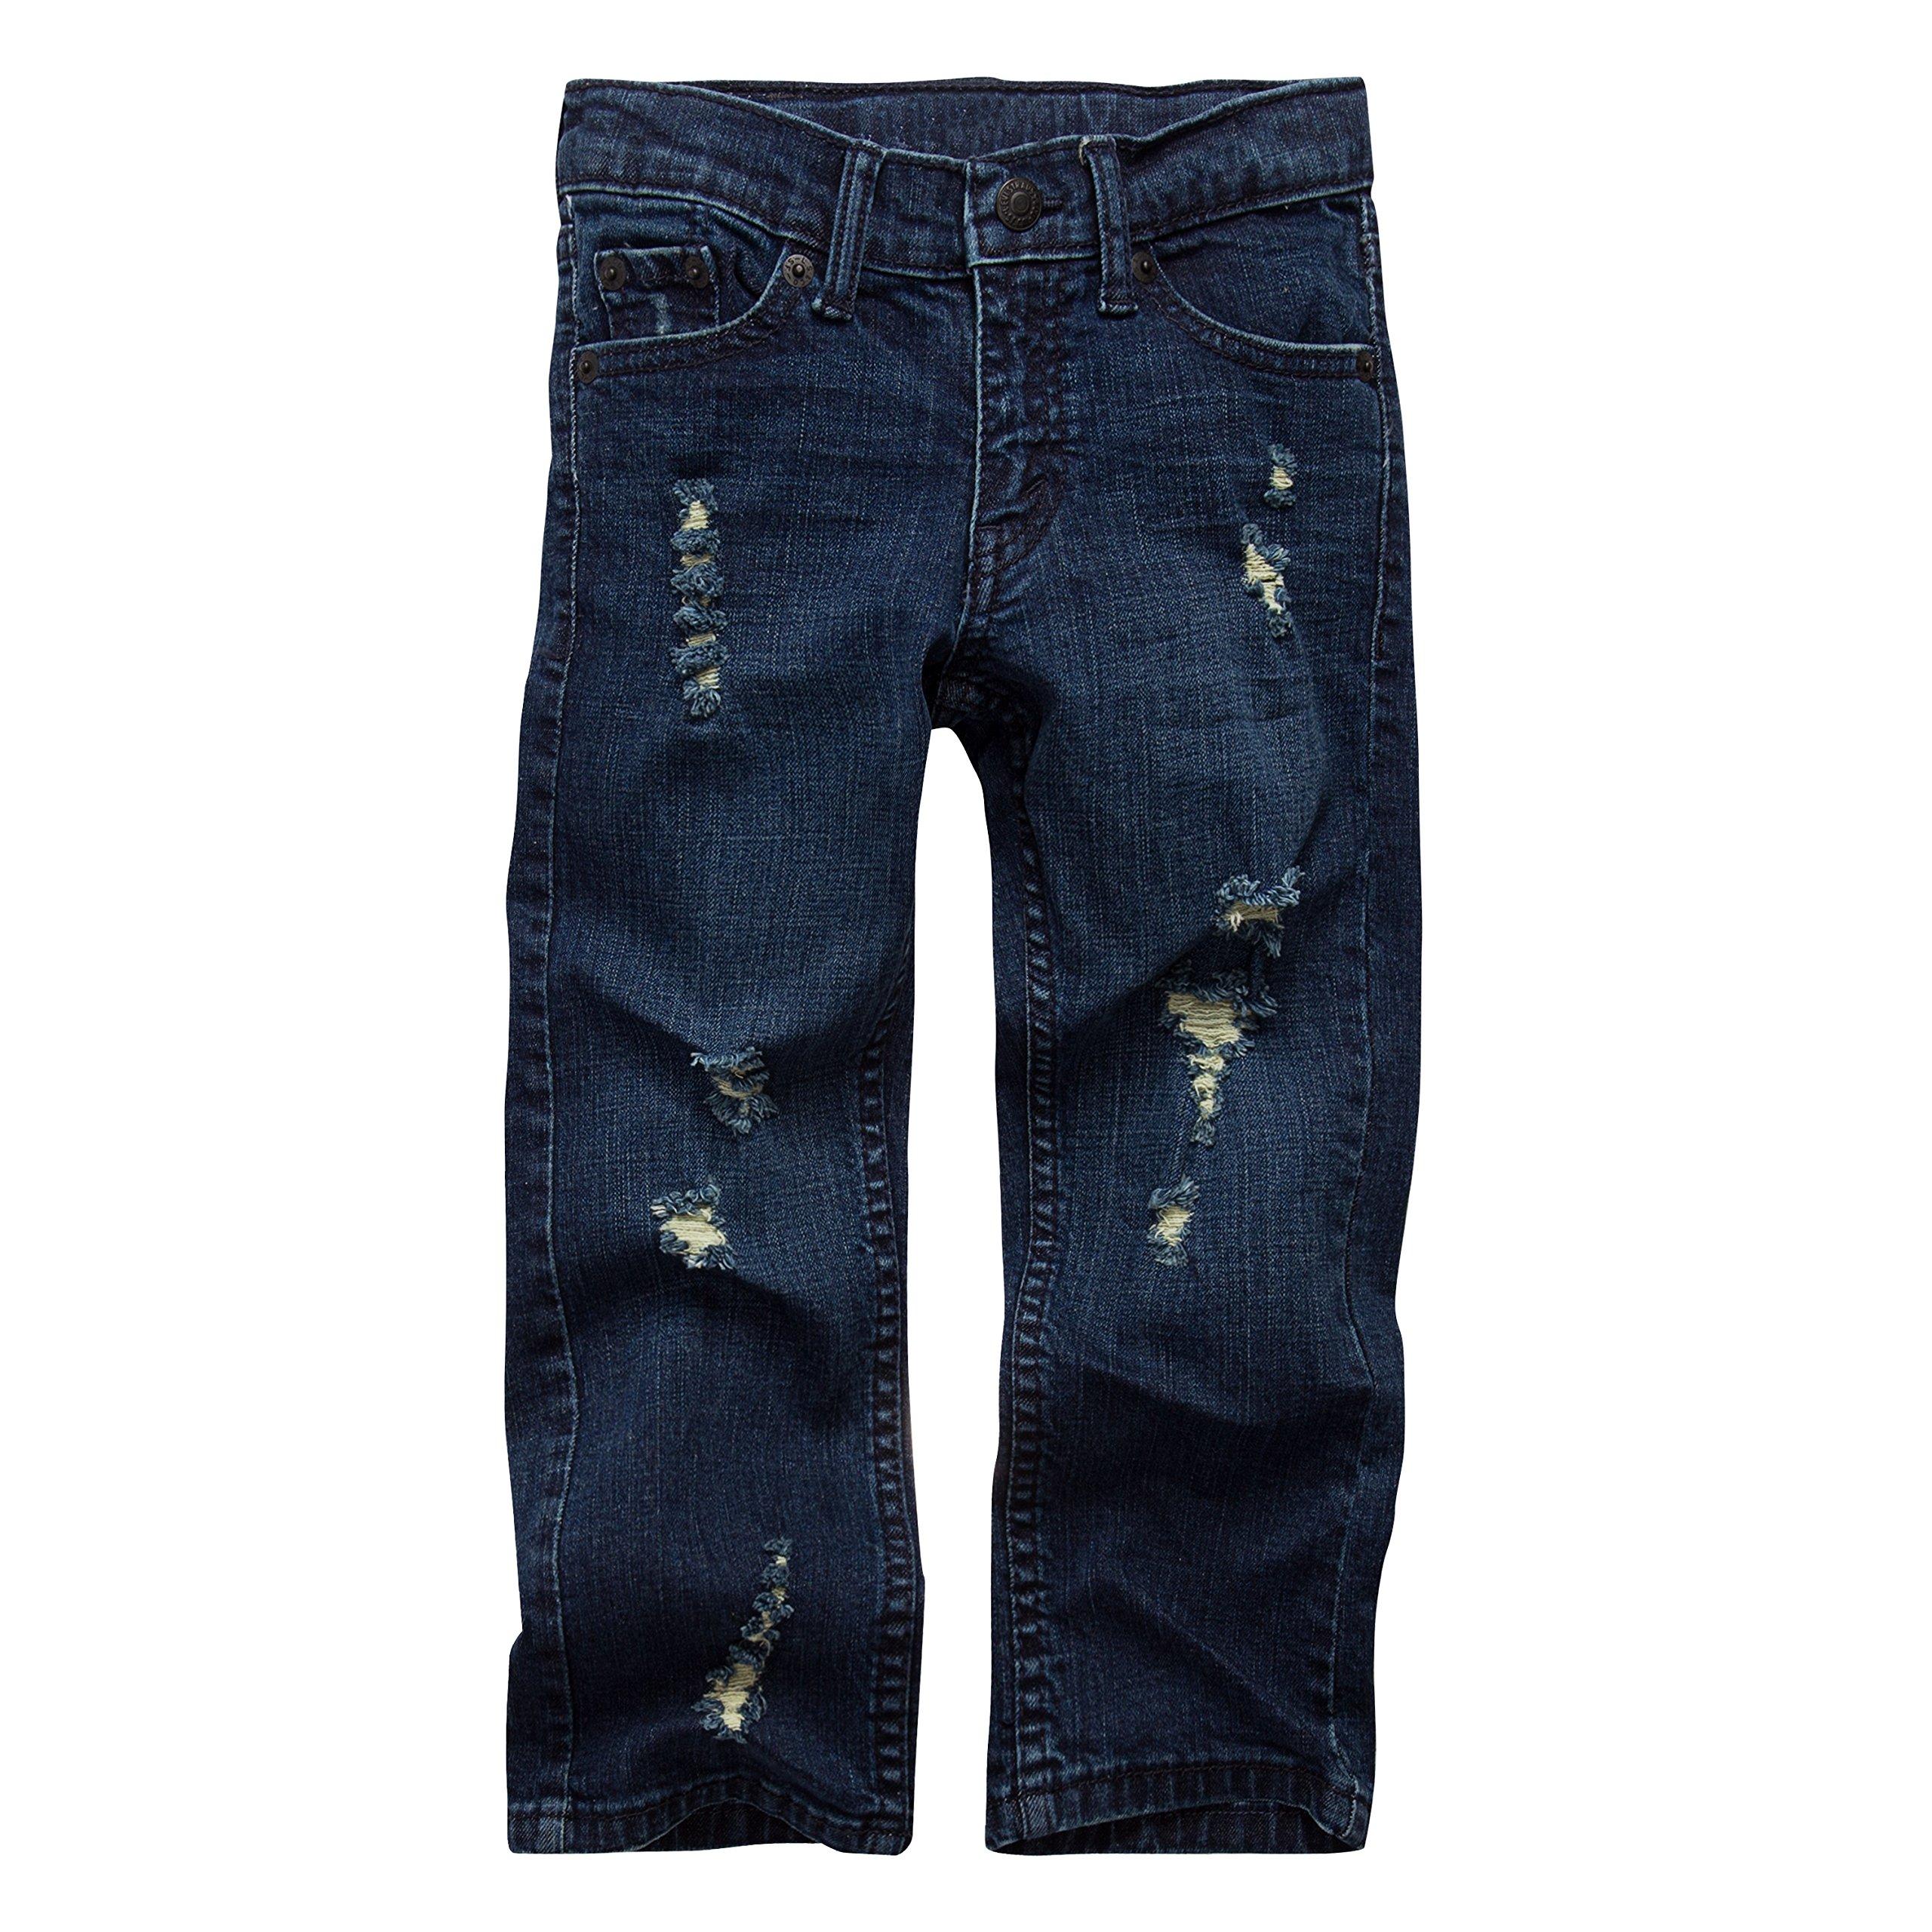 Levi's Boys' Big 511 Slim Fit Distressed Jeans, Jailhouse Rock, 16